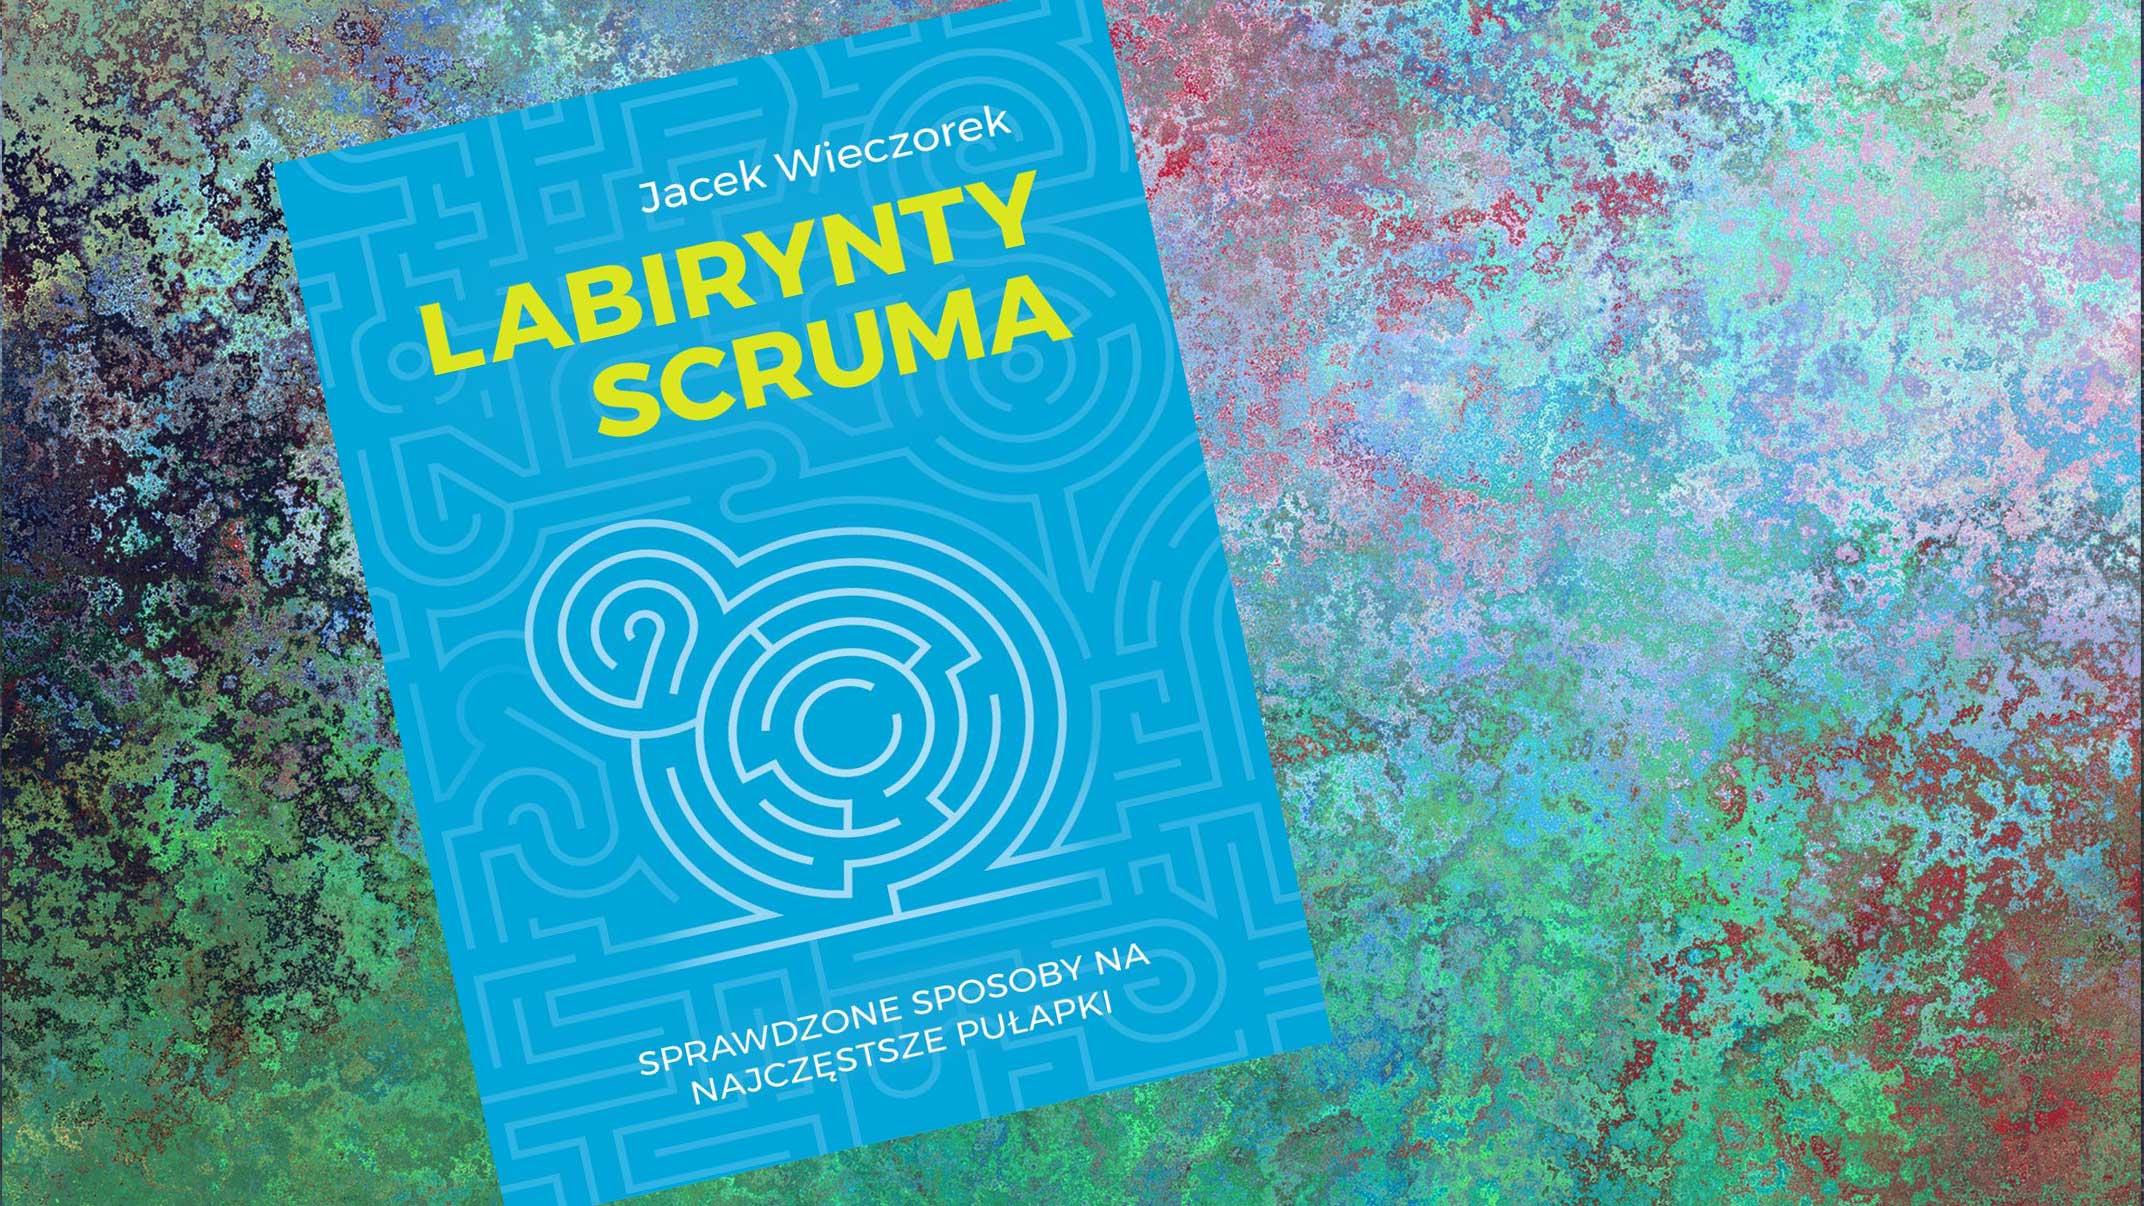 Labirynty Scruma